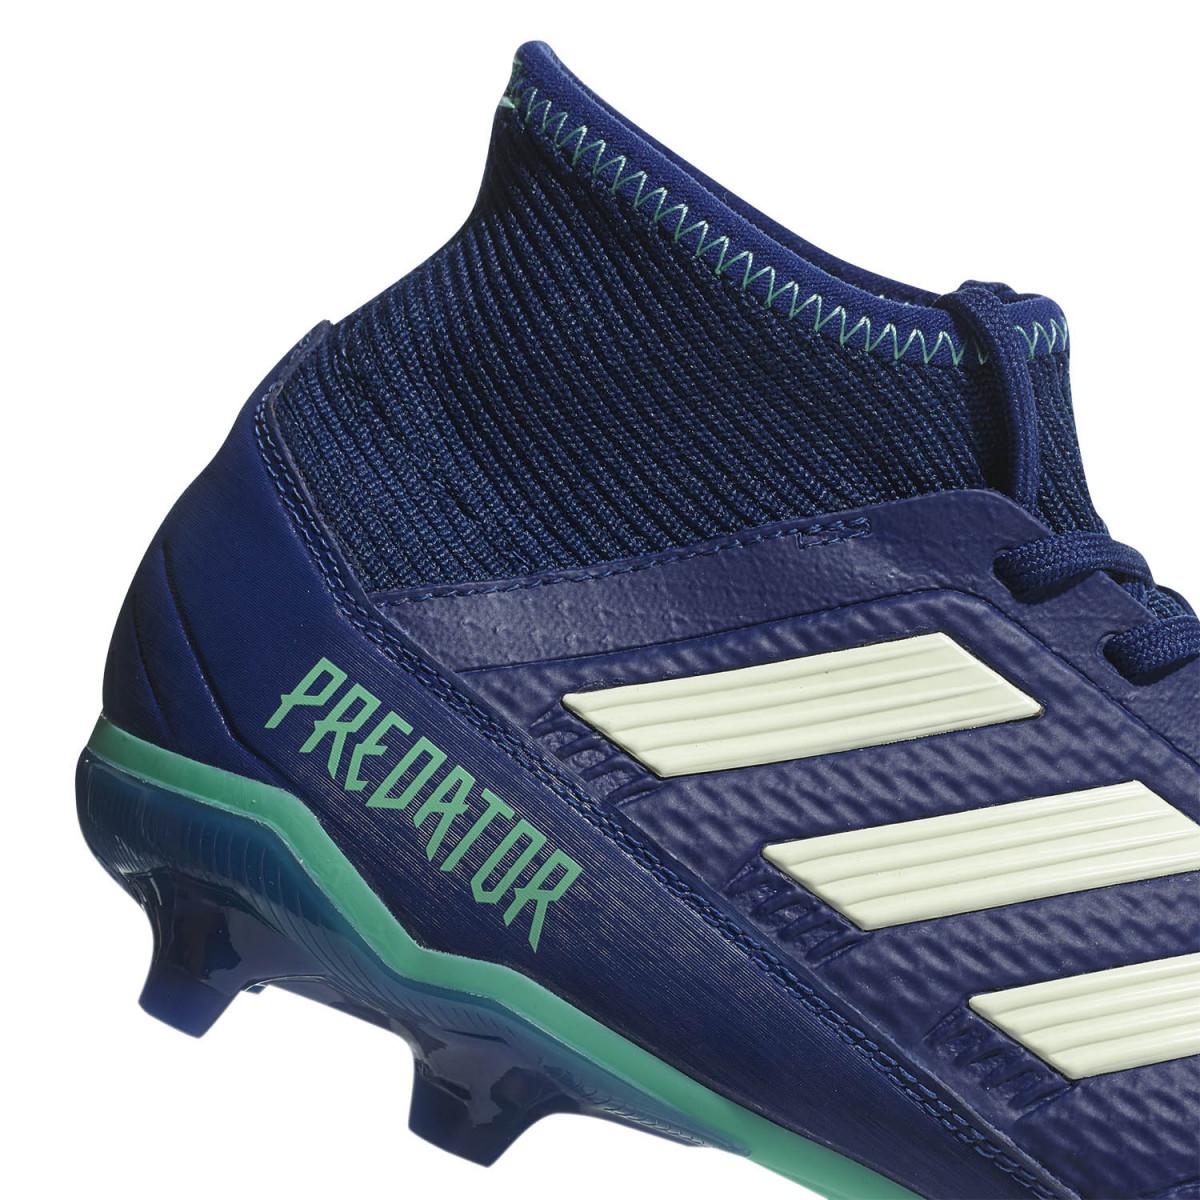 Botines Adidas Predator 18.3 Fg d2af5898d26c5